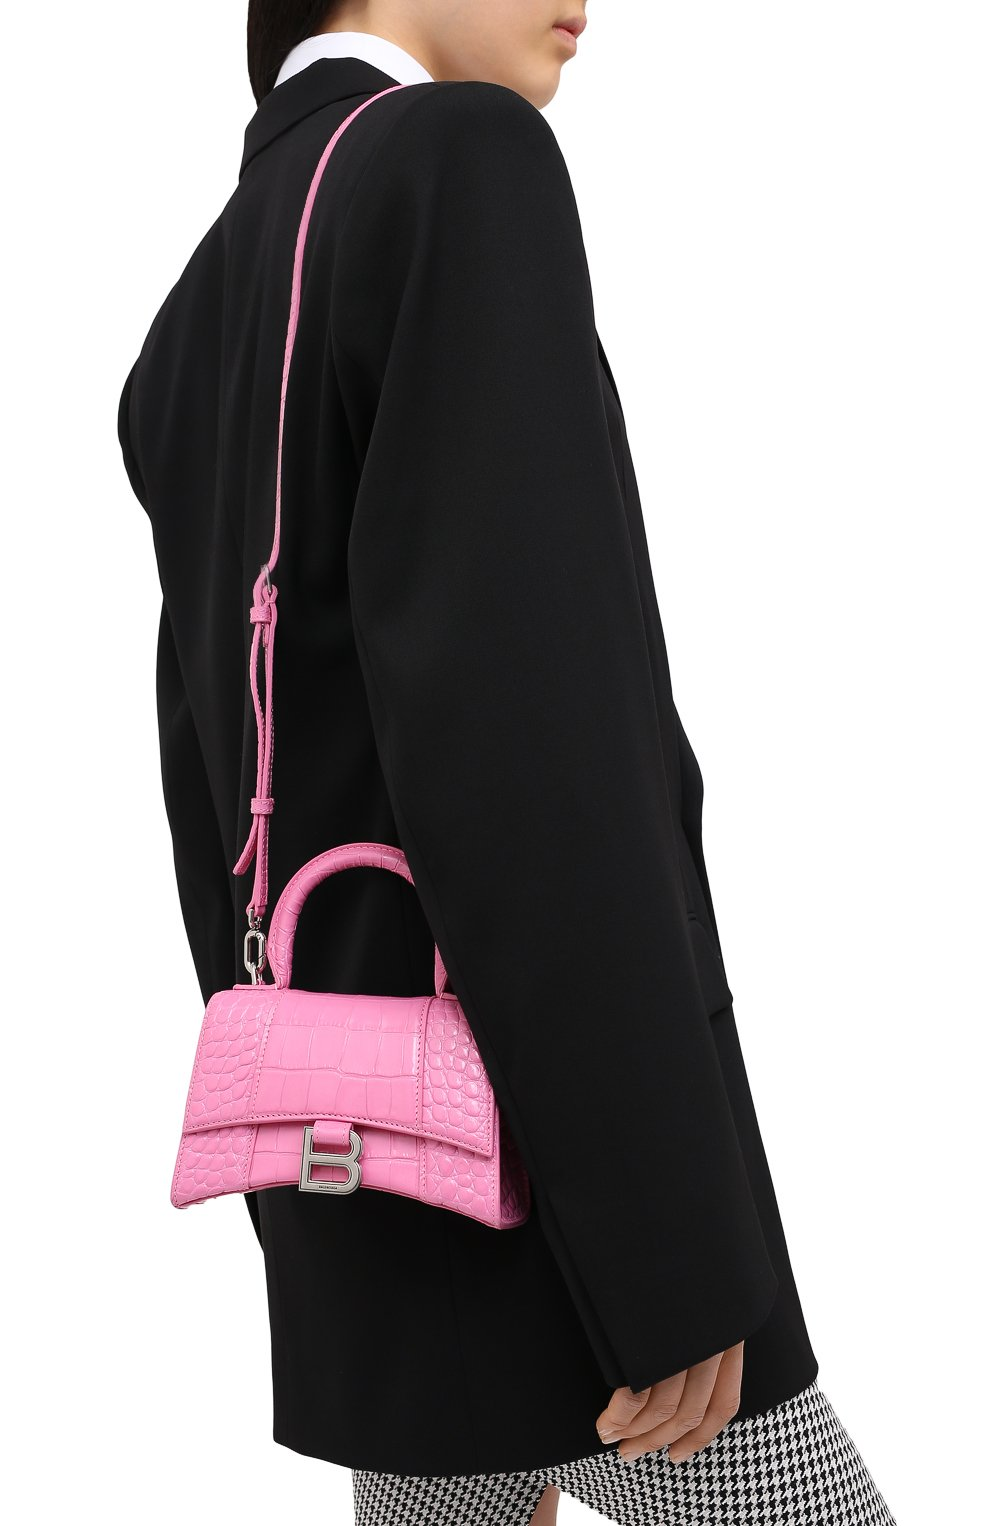 Женская сумка hourglass xs BALENCIAGA розового цвета, арт. 592833/1LR6Y   Фото 5 (Сумки-технические: Сумки через плечо, Сумки top-handle; Материал: Натуральная кожа; Размер: mini; Ремень/цепочка: На ремешке)